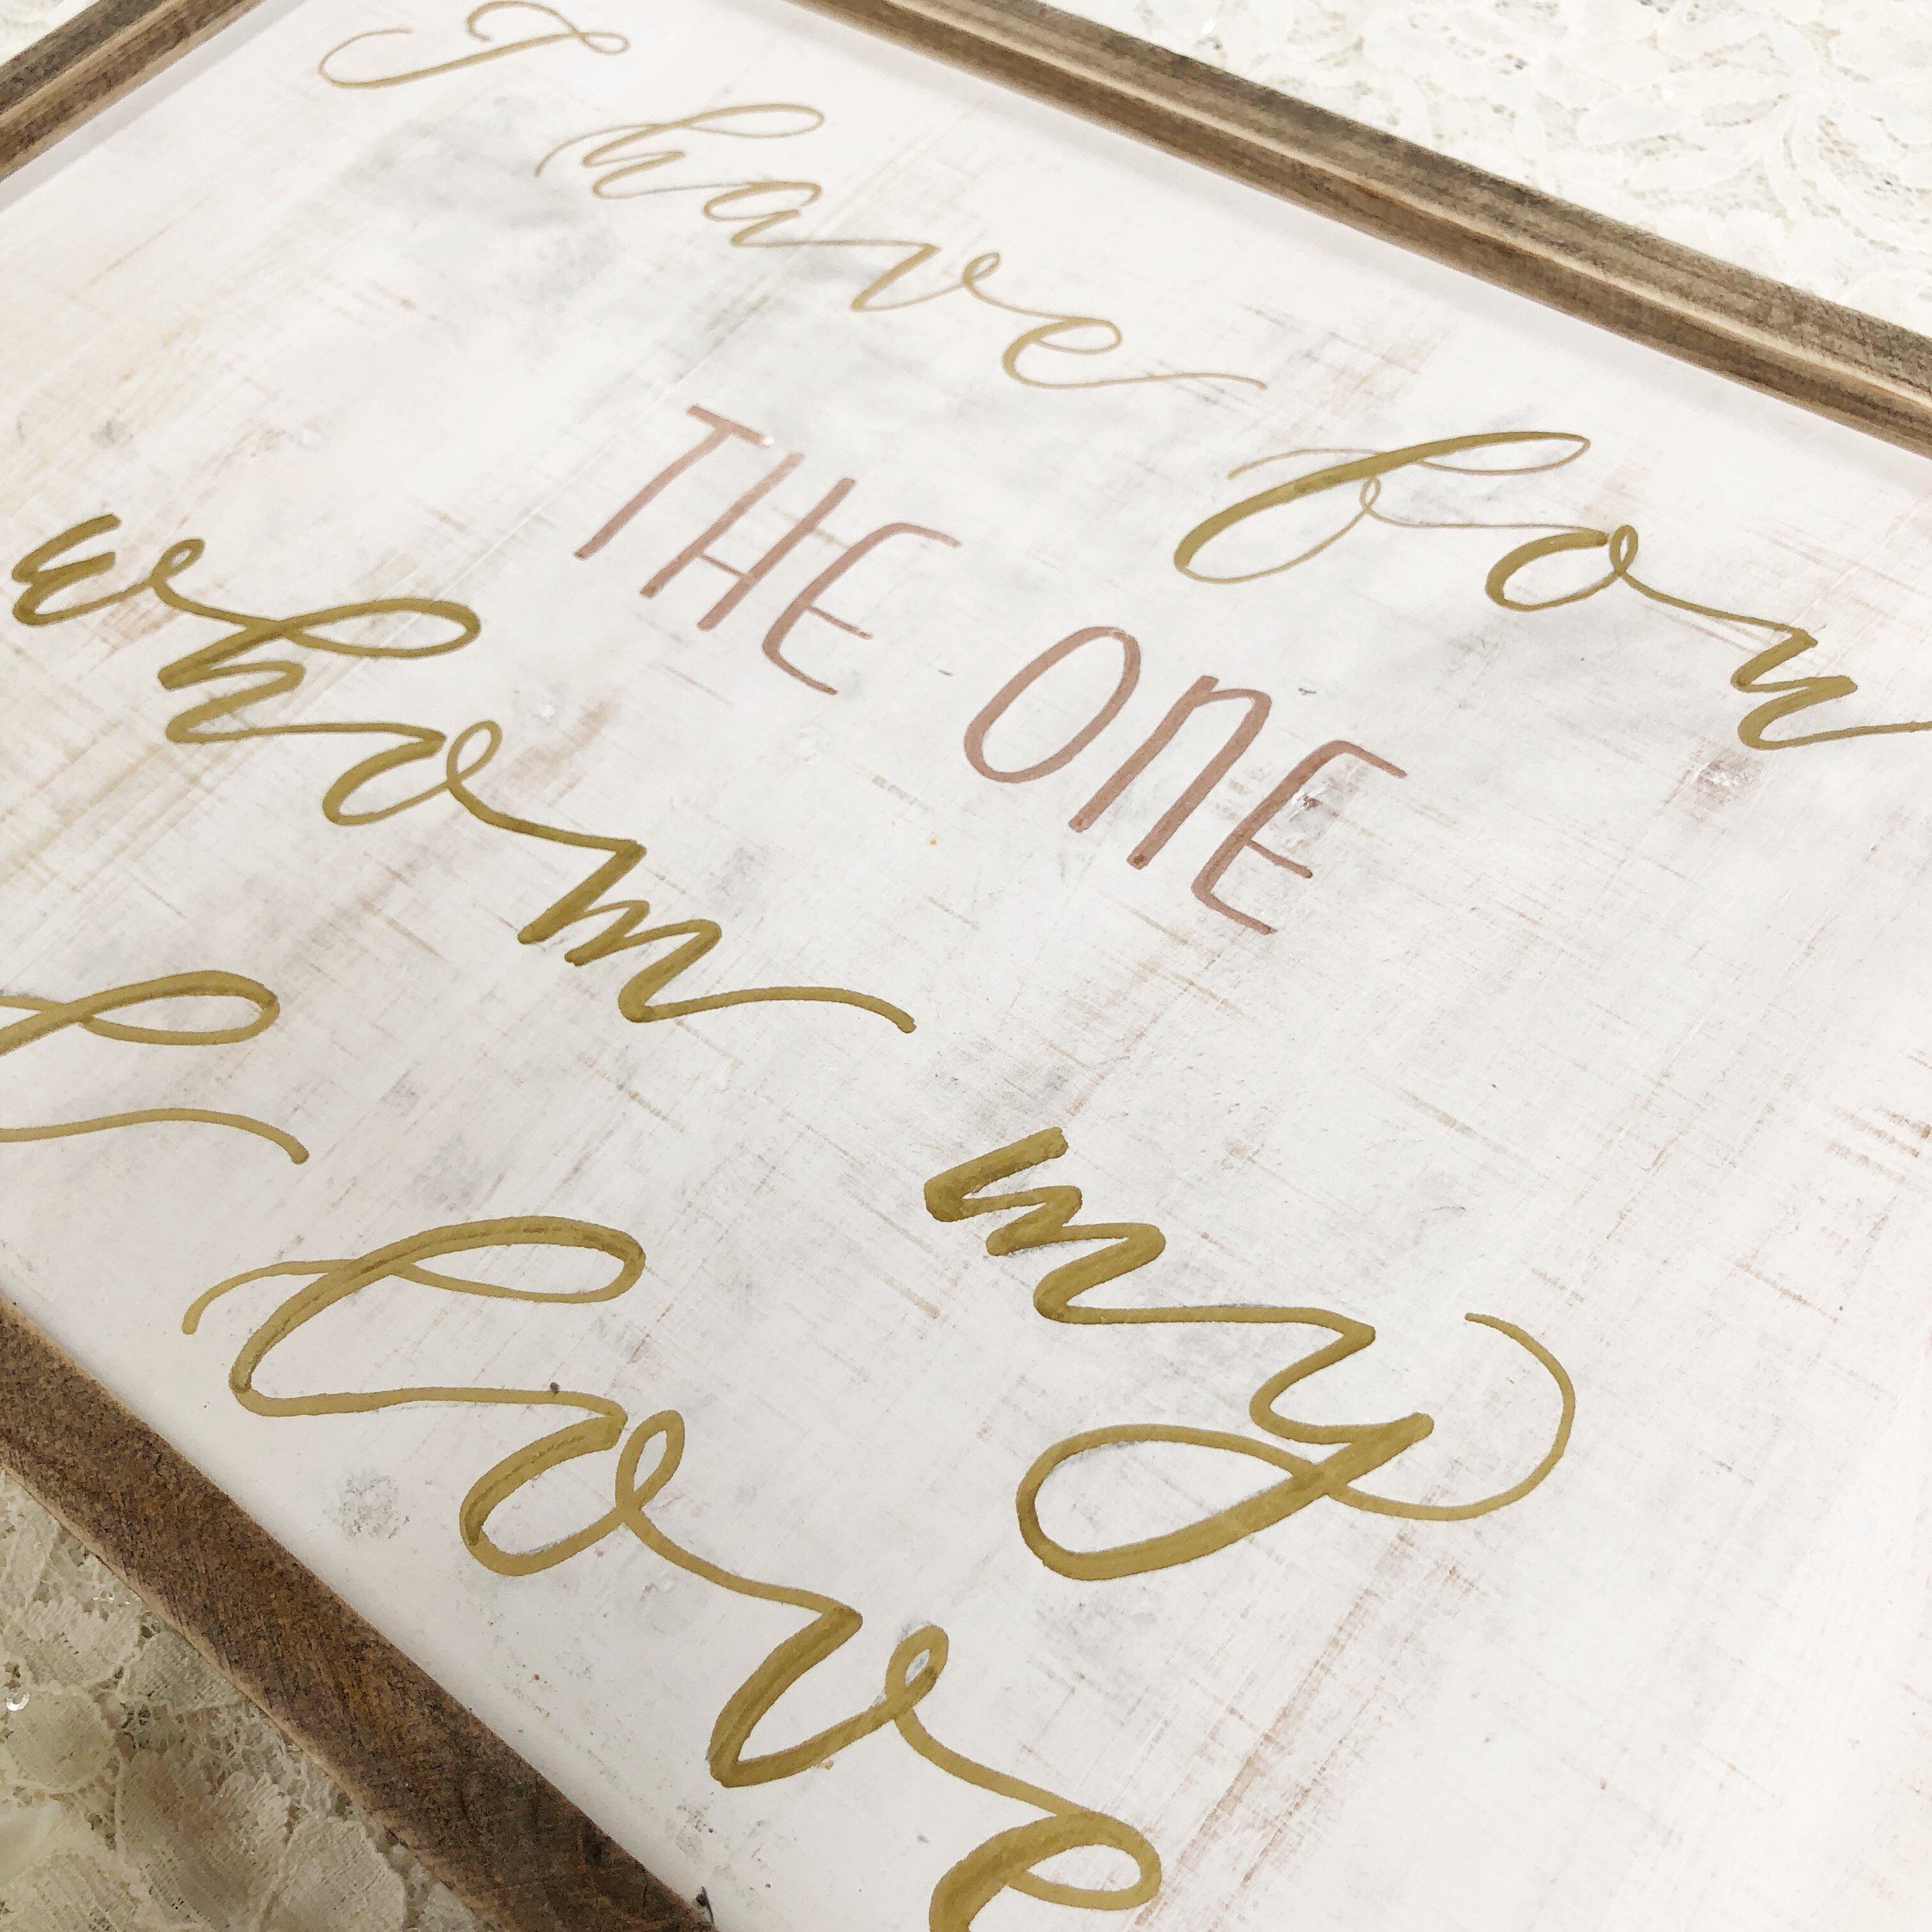 Central PA, York PA, JesSmith Designs, custom, wedding, invitations, bridal, announcements, save the date, baby, hanover, calligraphy, baltimore, wedding invitations, lancaster, gettysburg-02-17 12.16.36.jpg